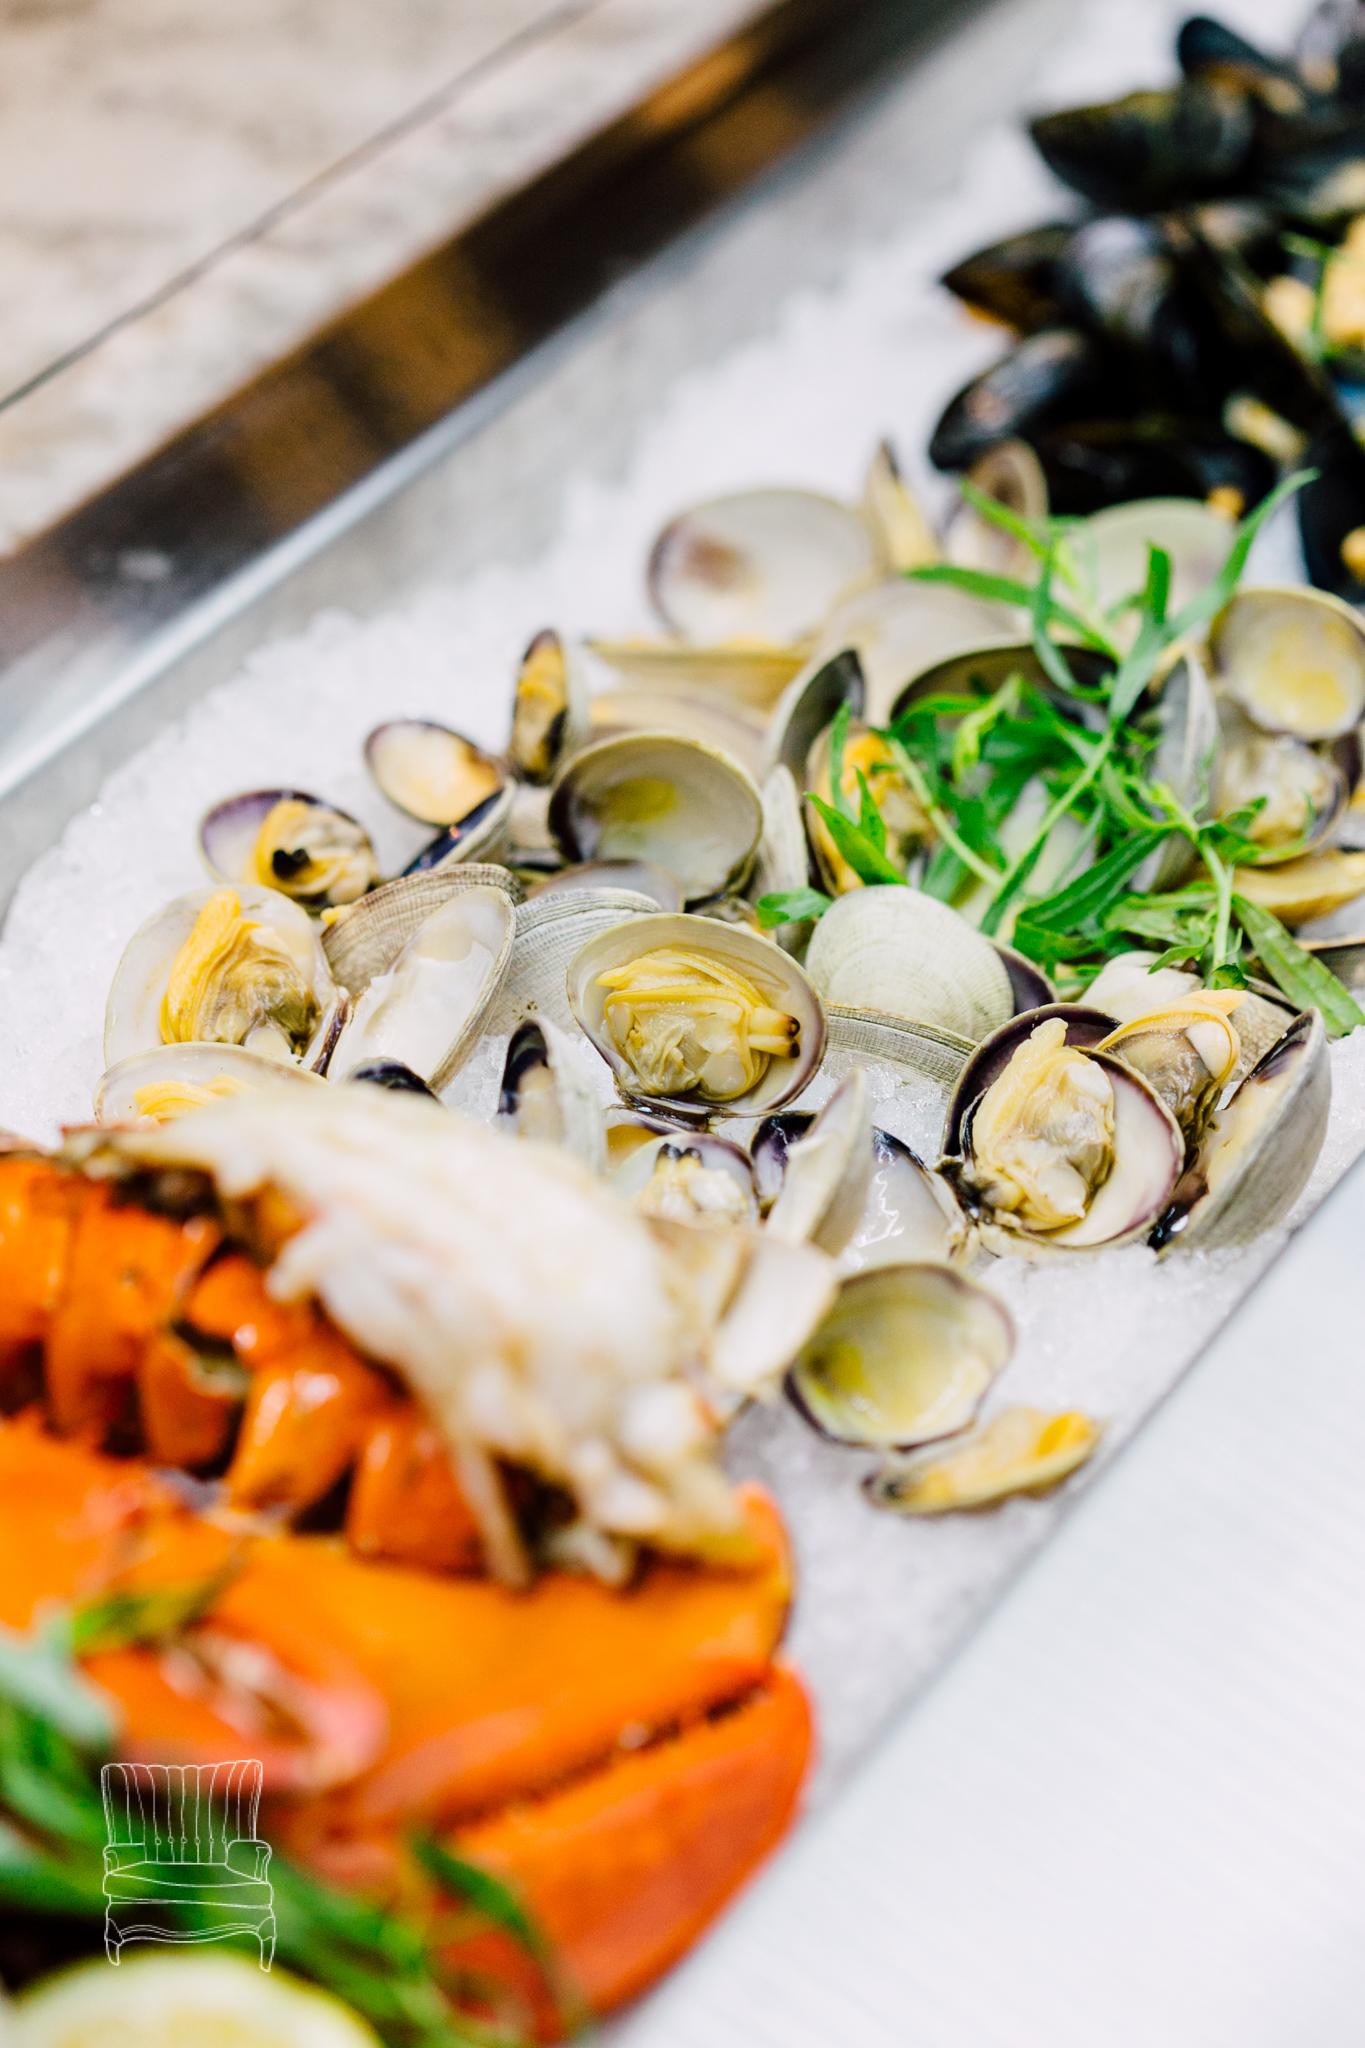 bellingham-sheraton-btown-raw-bar-seafood-katheryn-moran-food-4.jpg